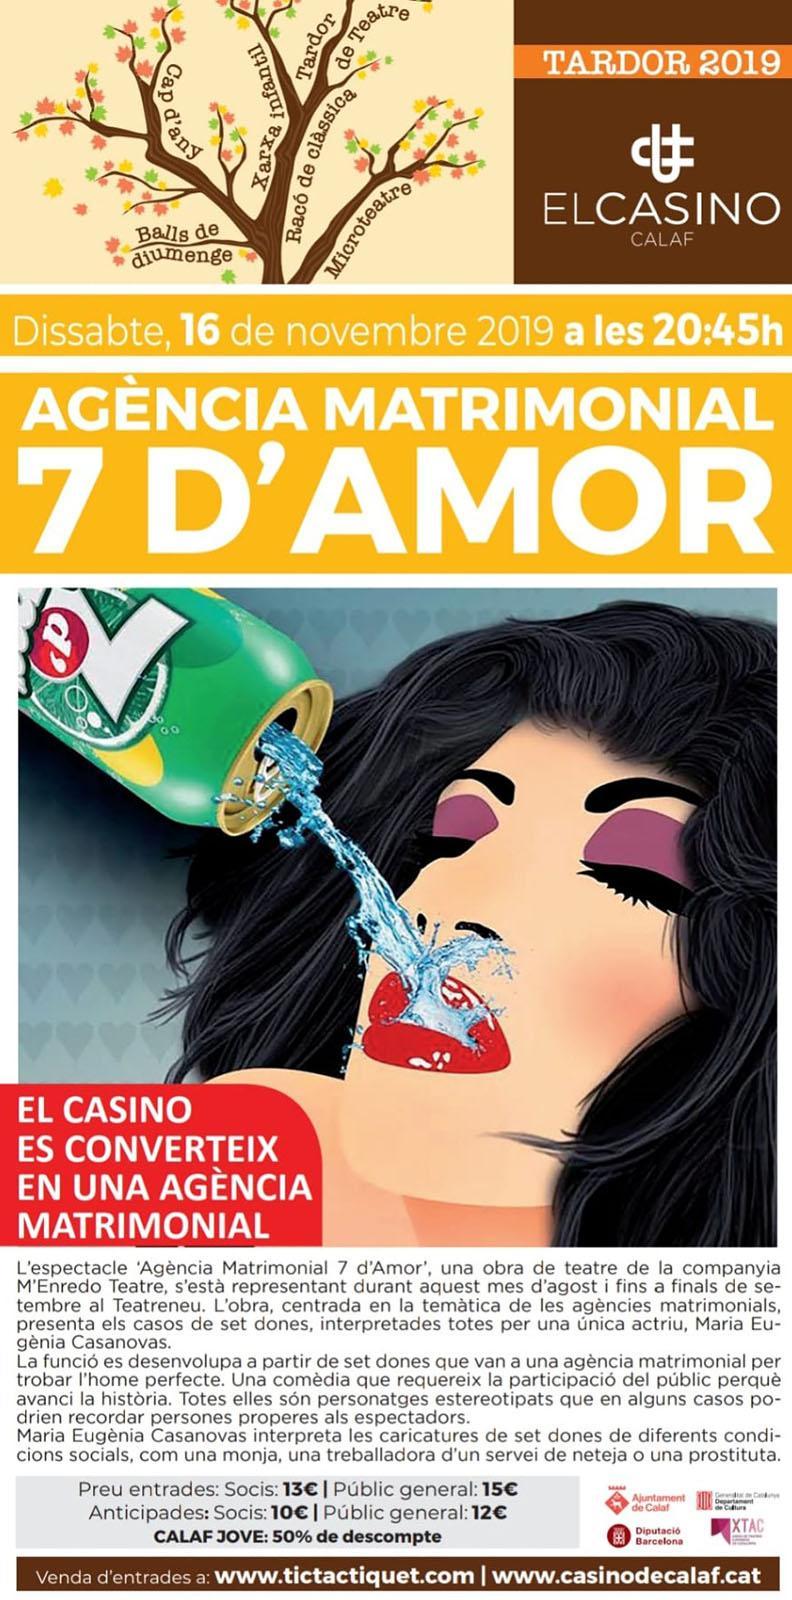 cartell Teatre 'Agència matrimonial 7 d'amor'